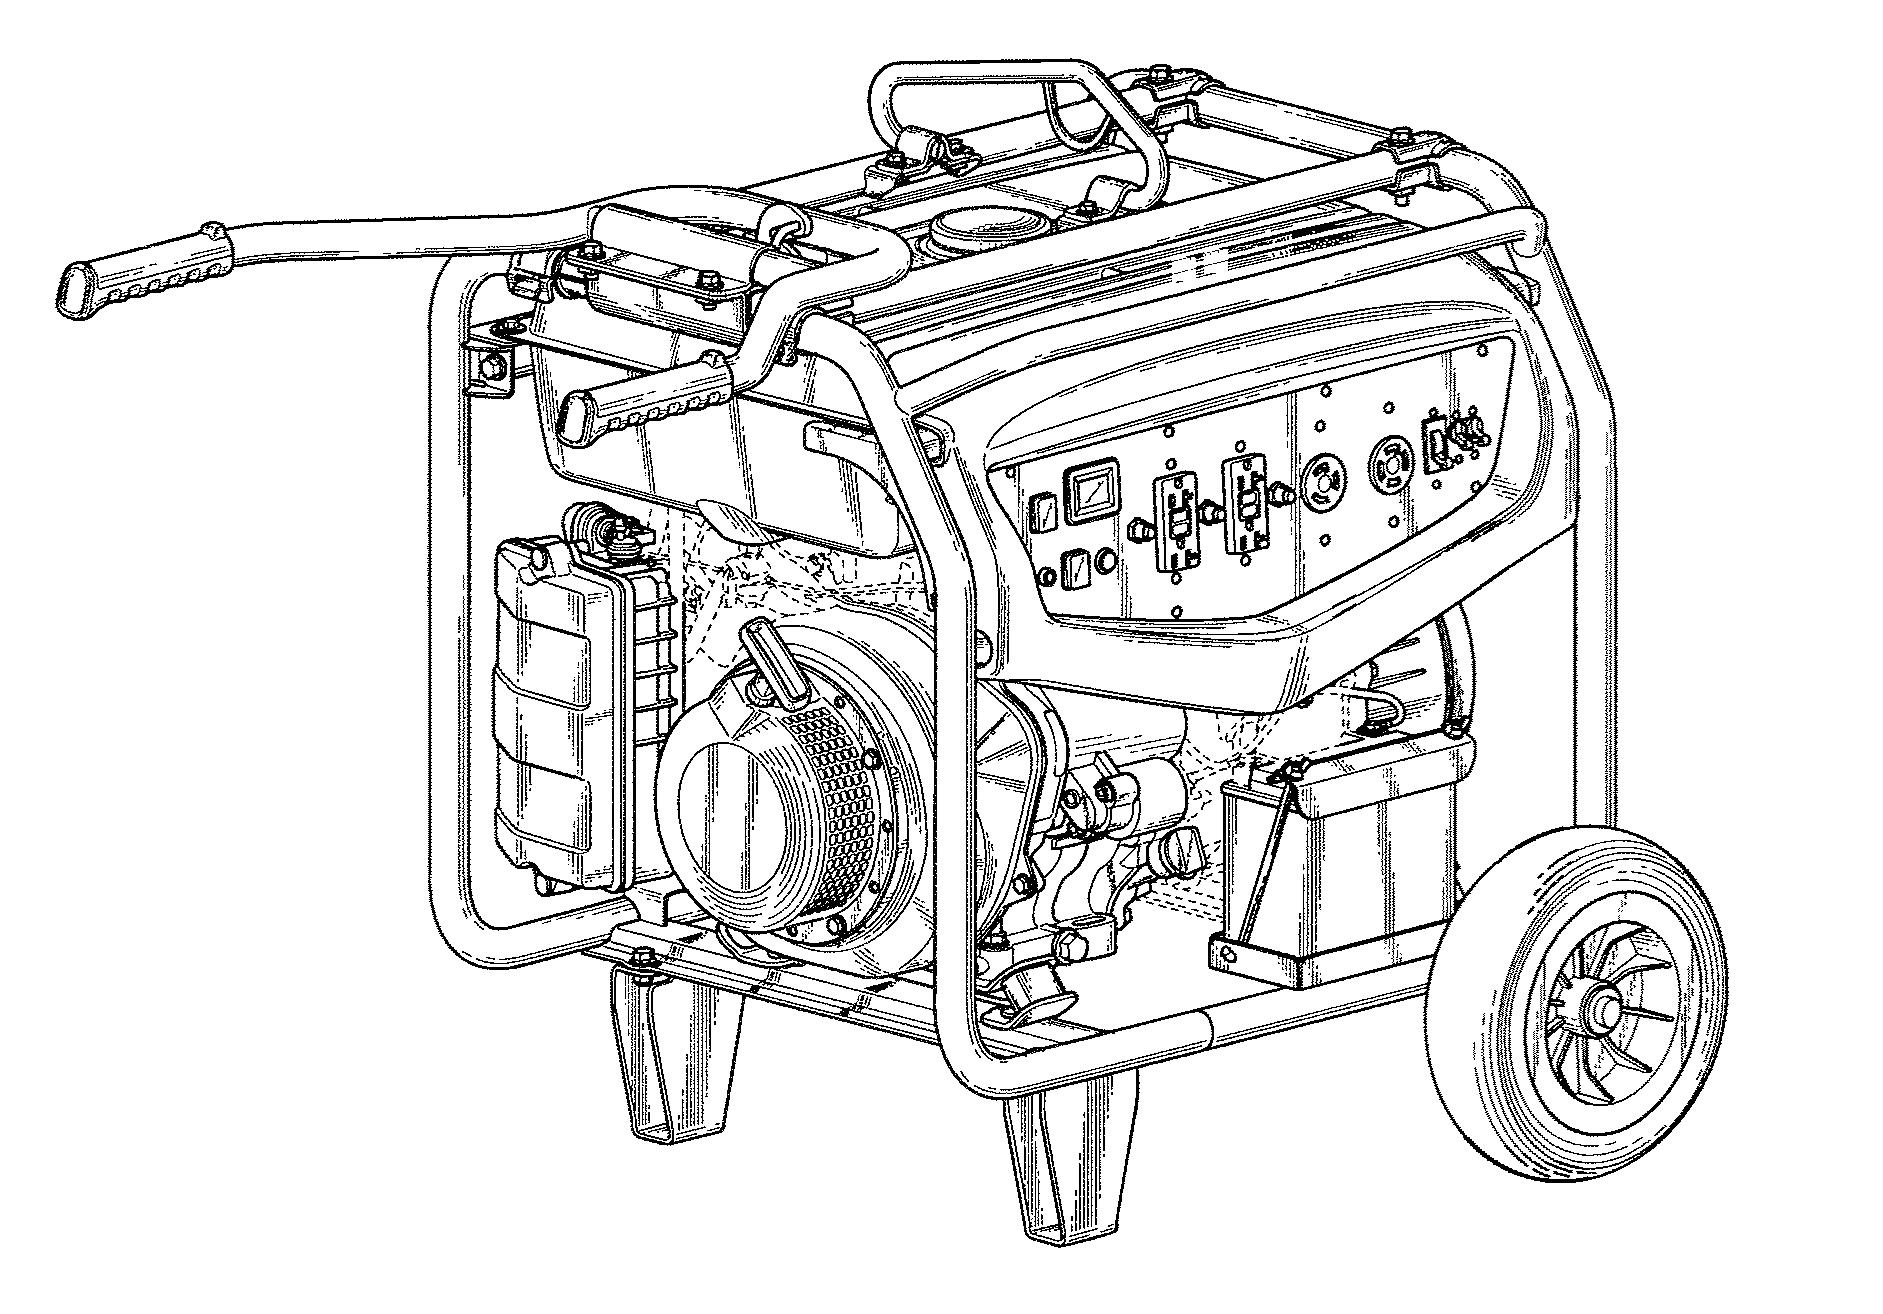 "US-D746229-S1 ""Engine generator"" Yamaha Motor Power Products Co Ltd"